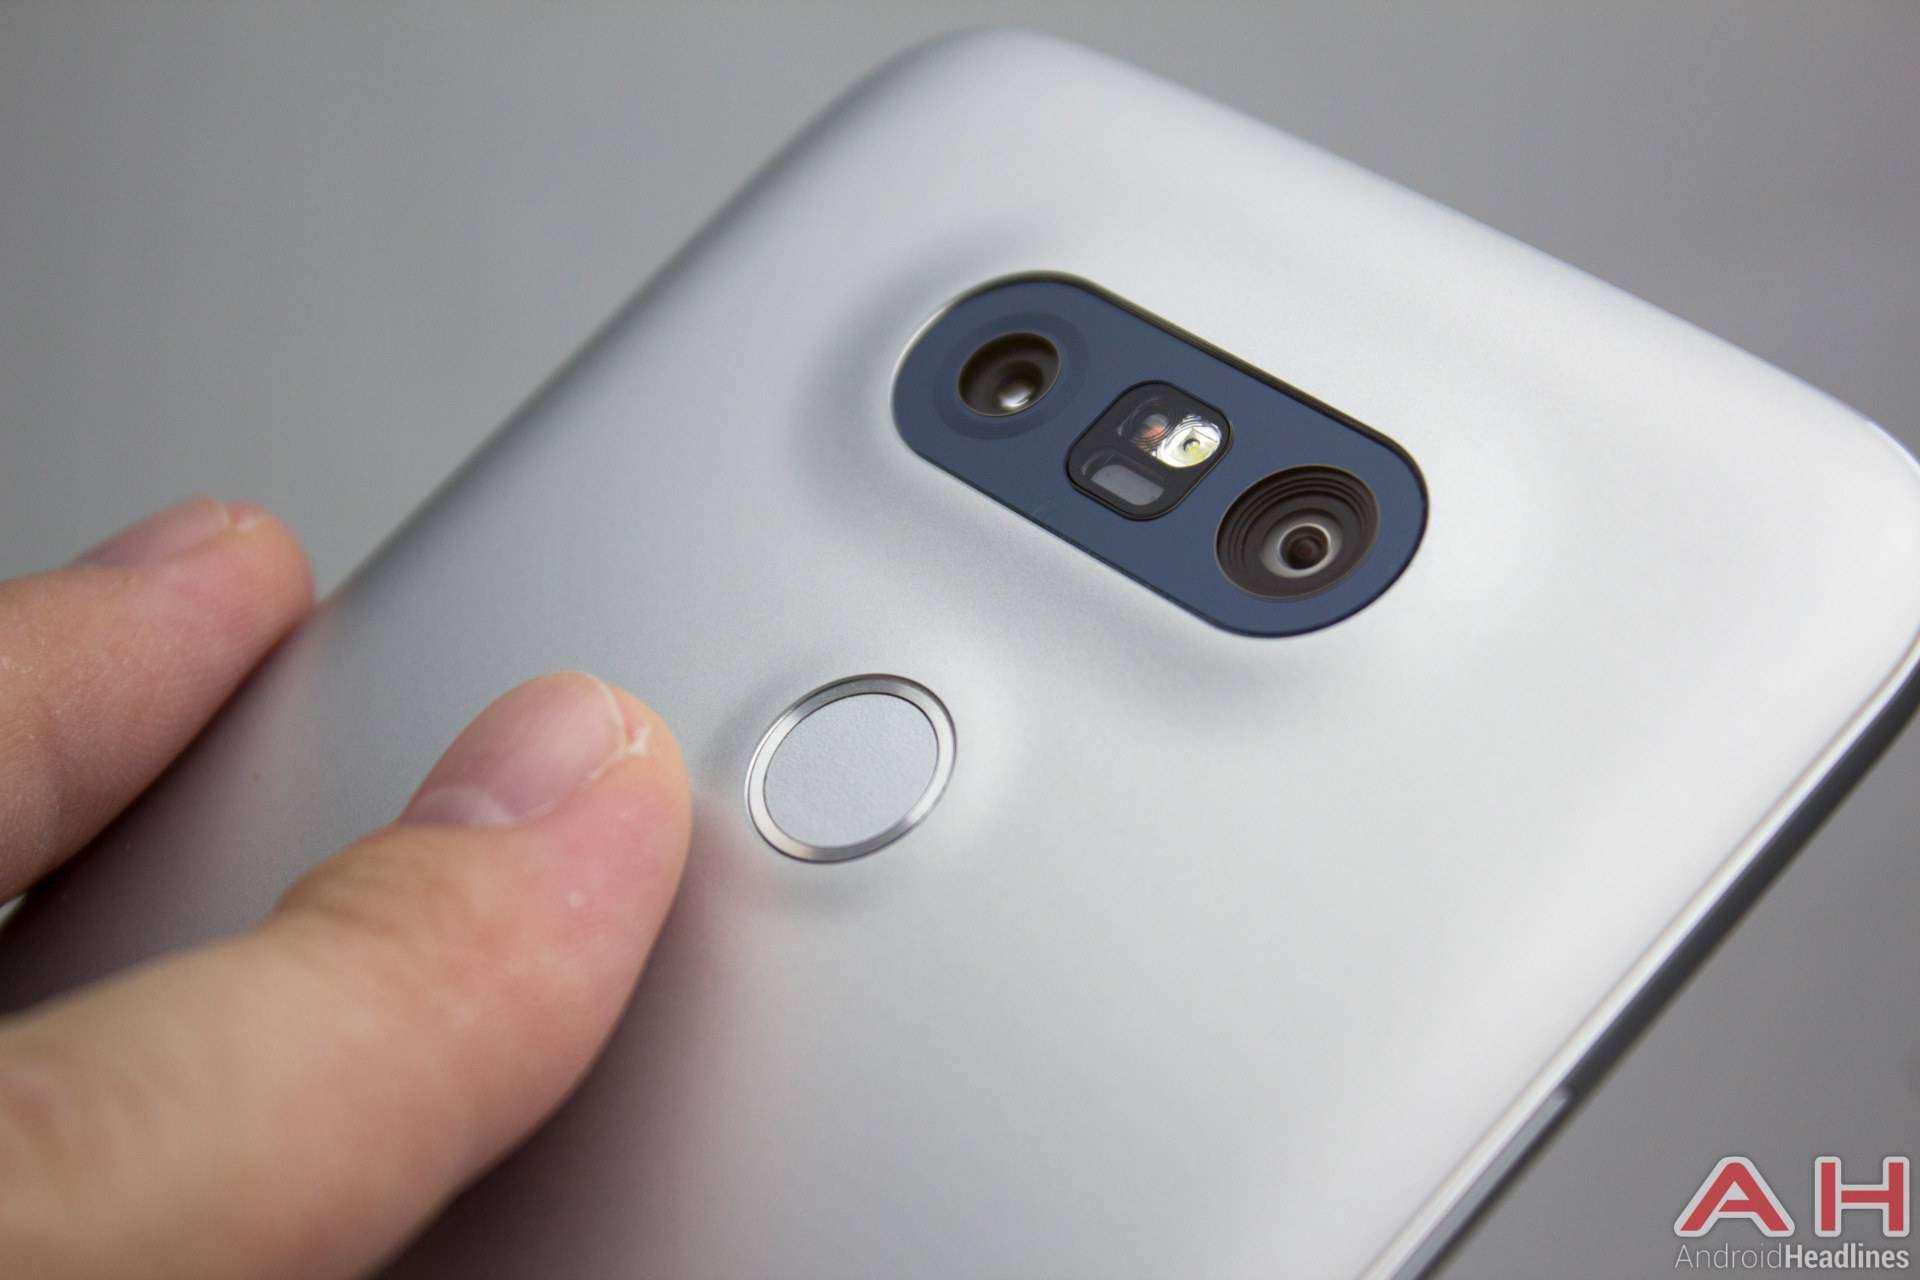 LG G5 AH NS fingerprint